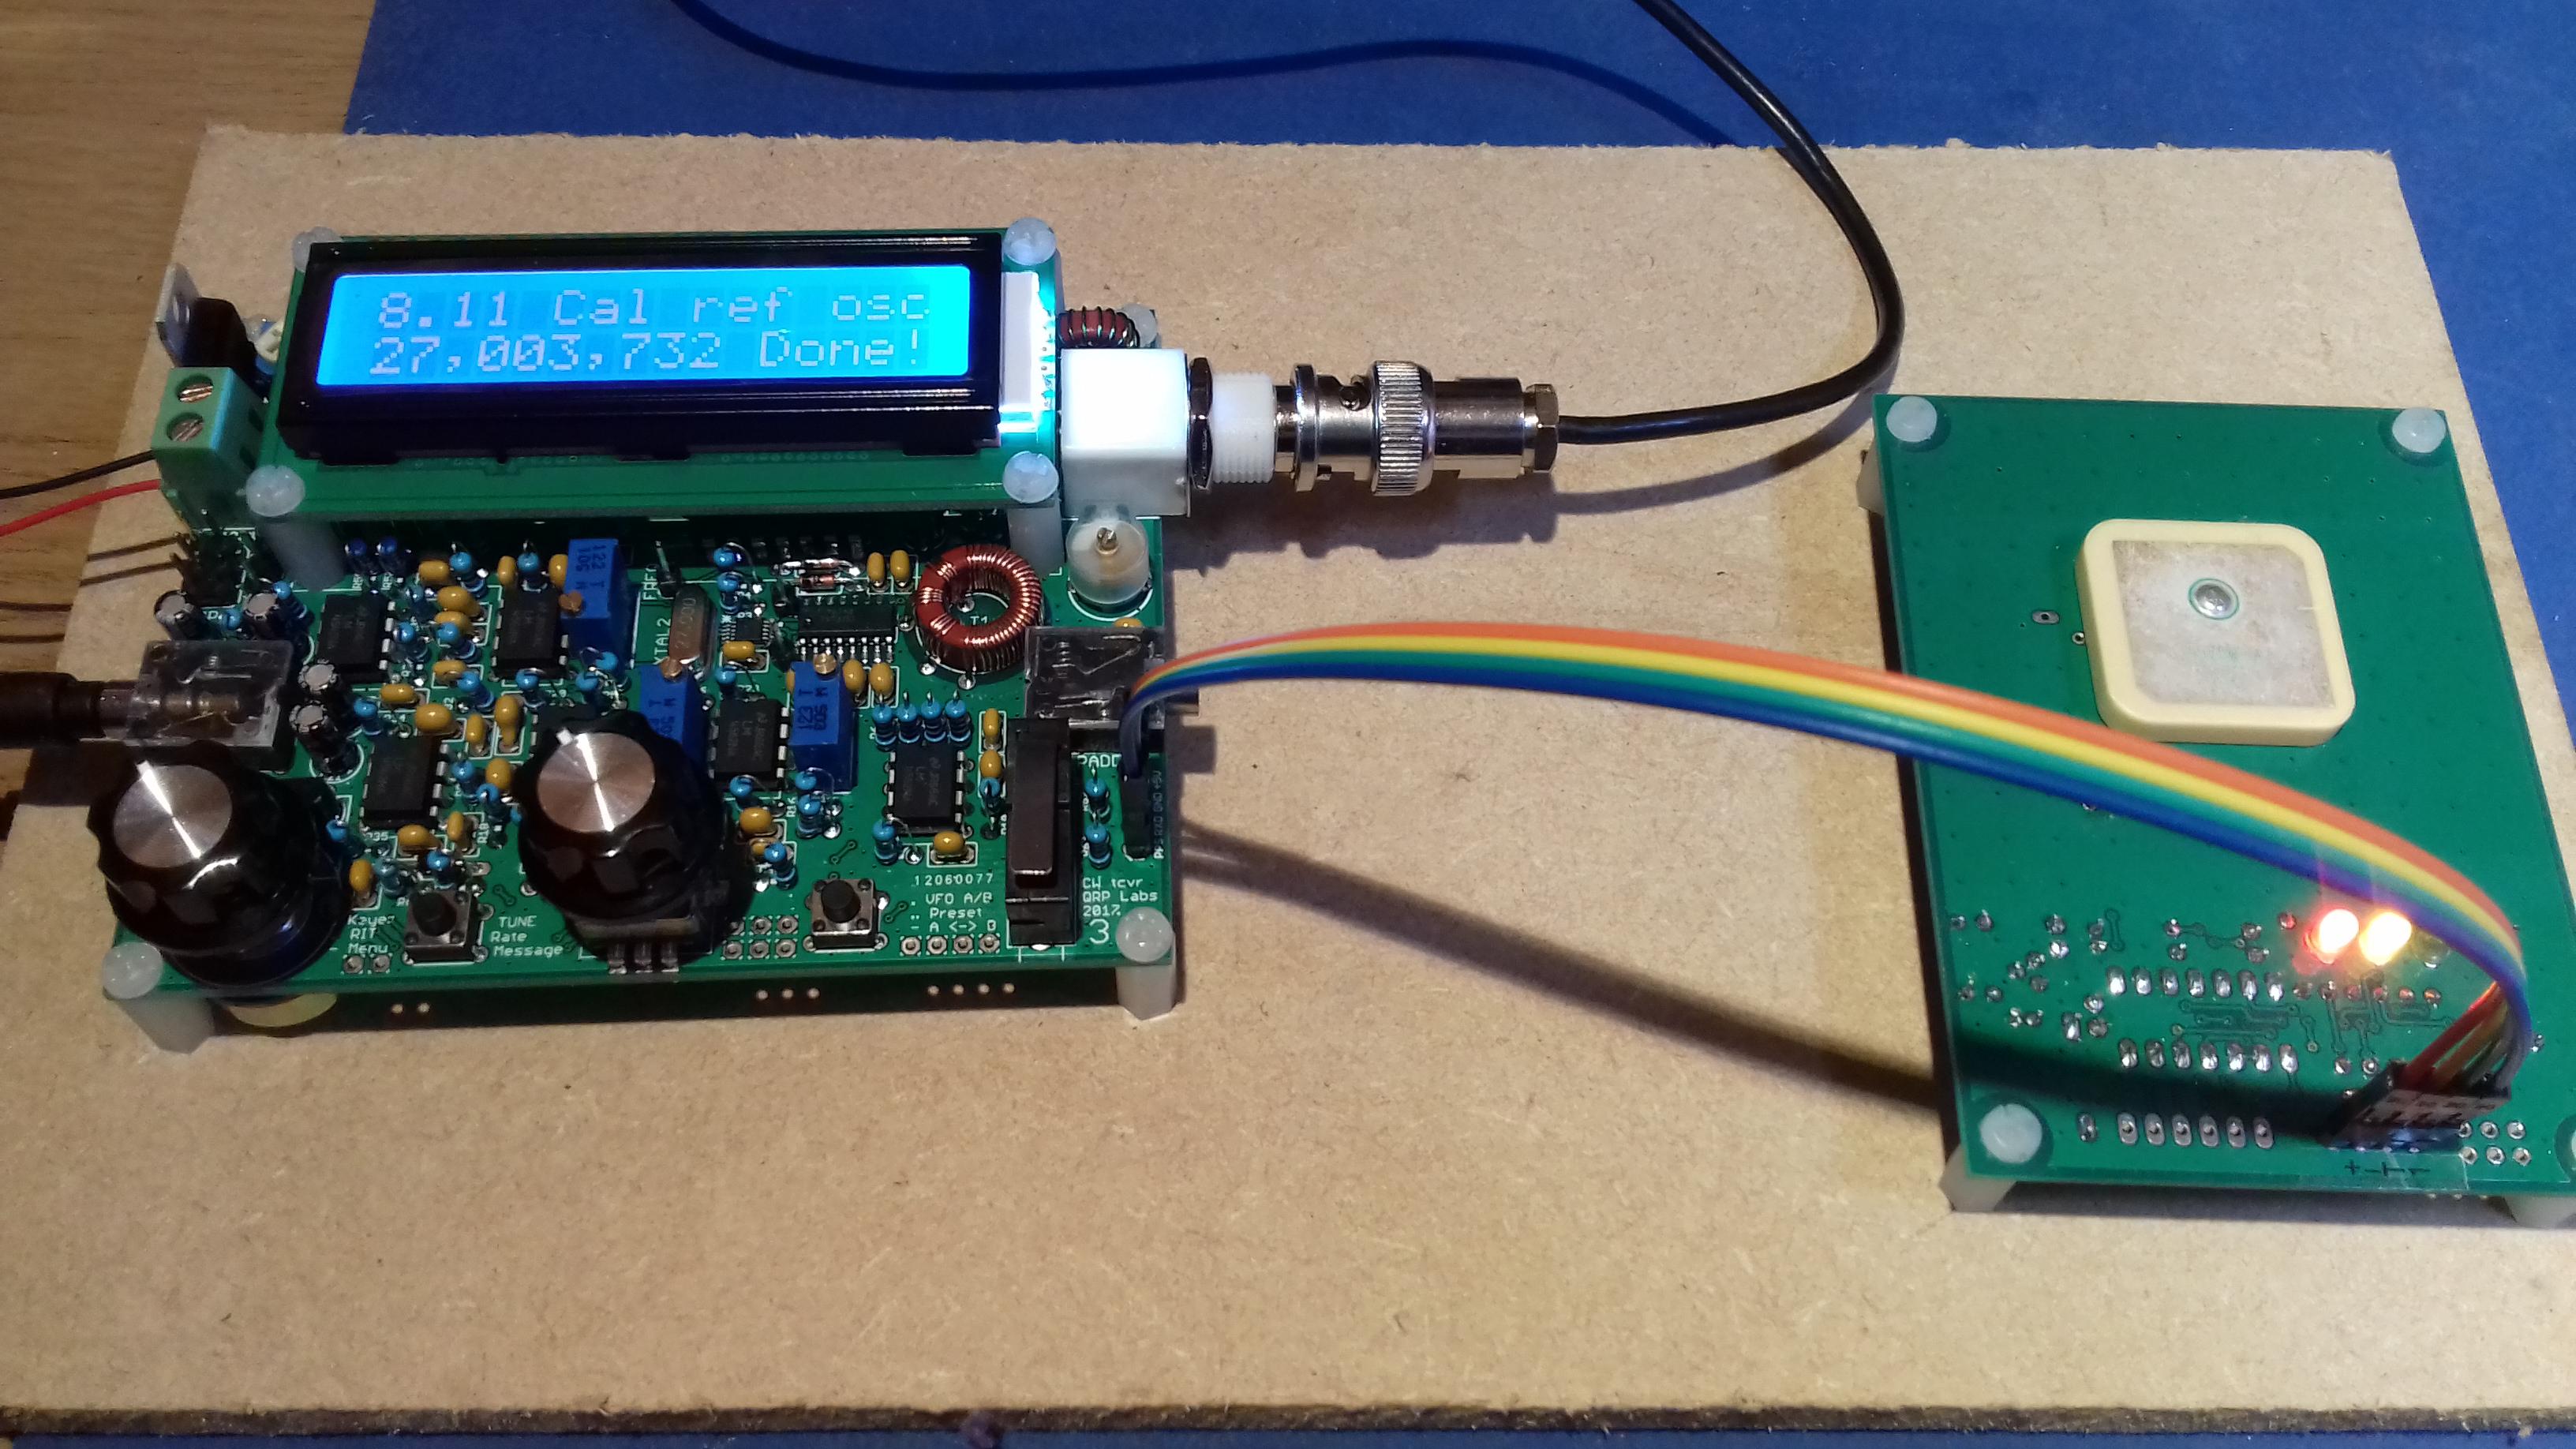 Qcx qrp rig - Radios & Power - SOTA Reflector